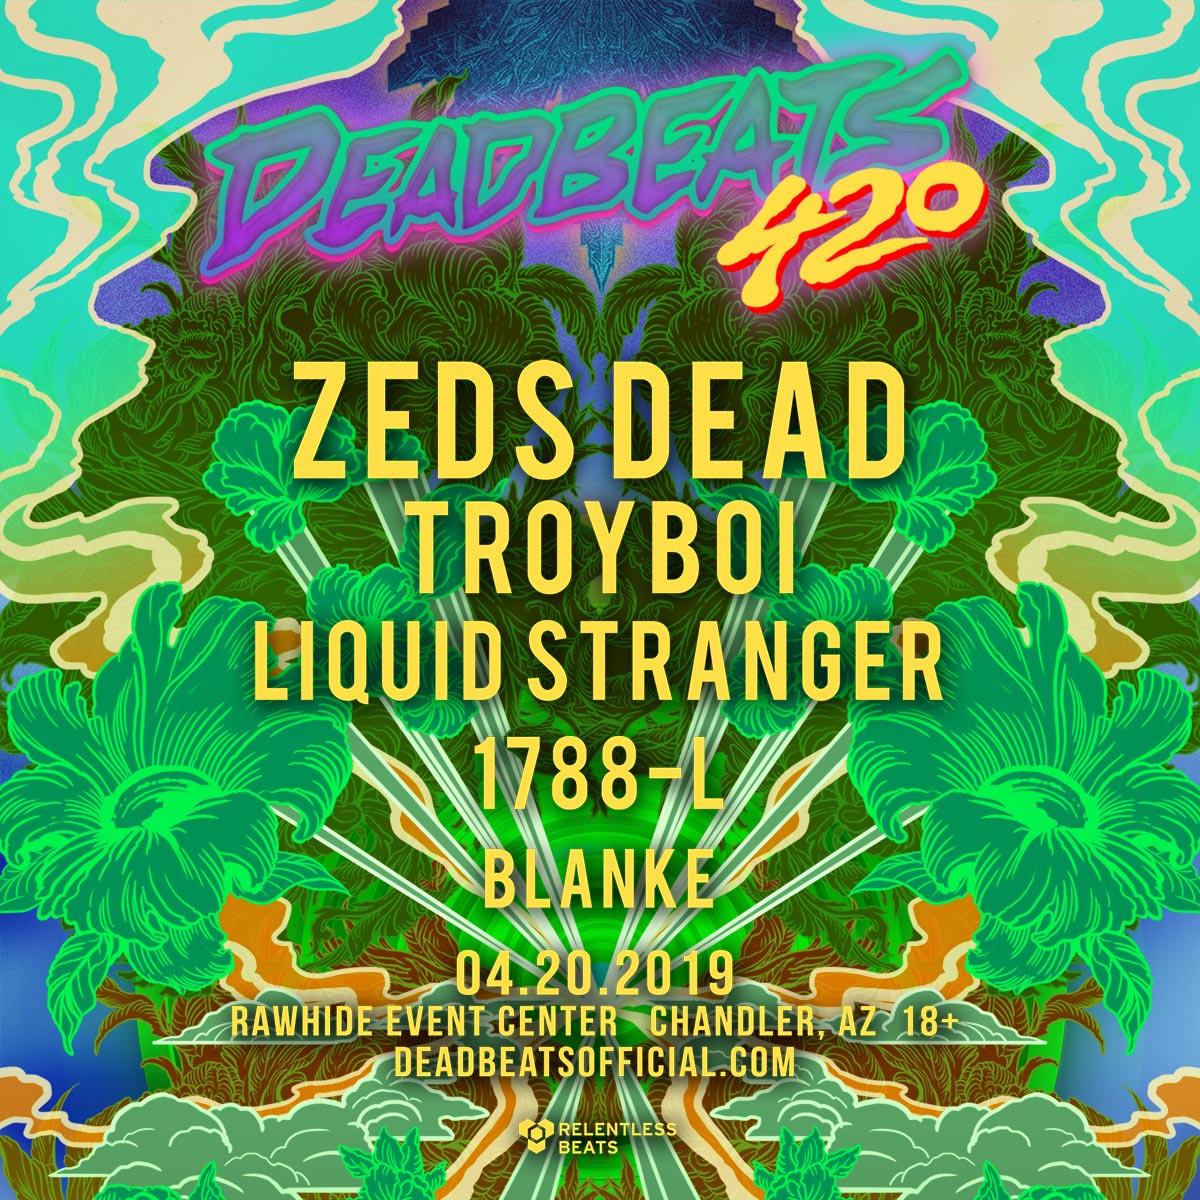 Flyer for Deadbeats 420